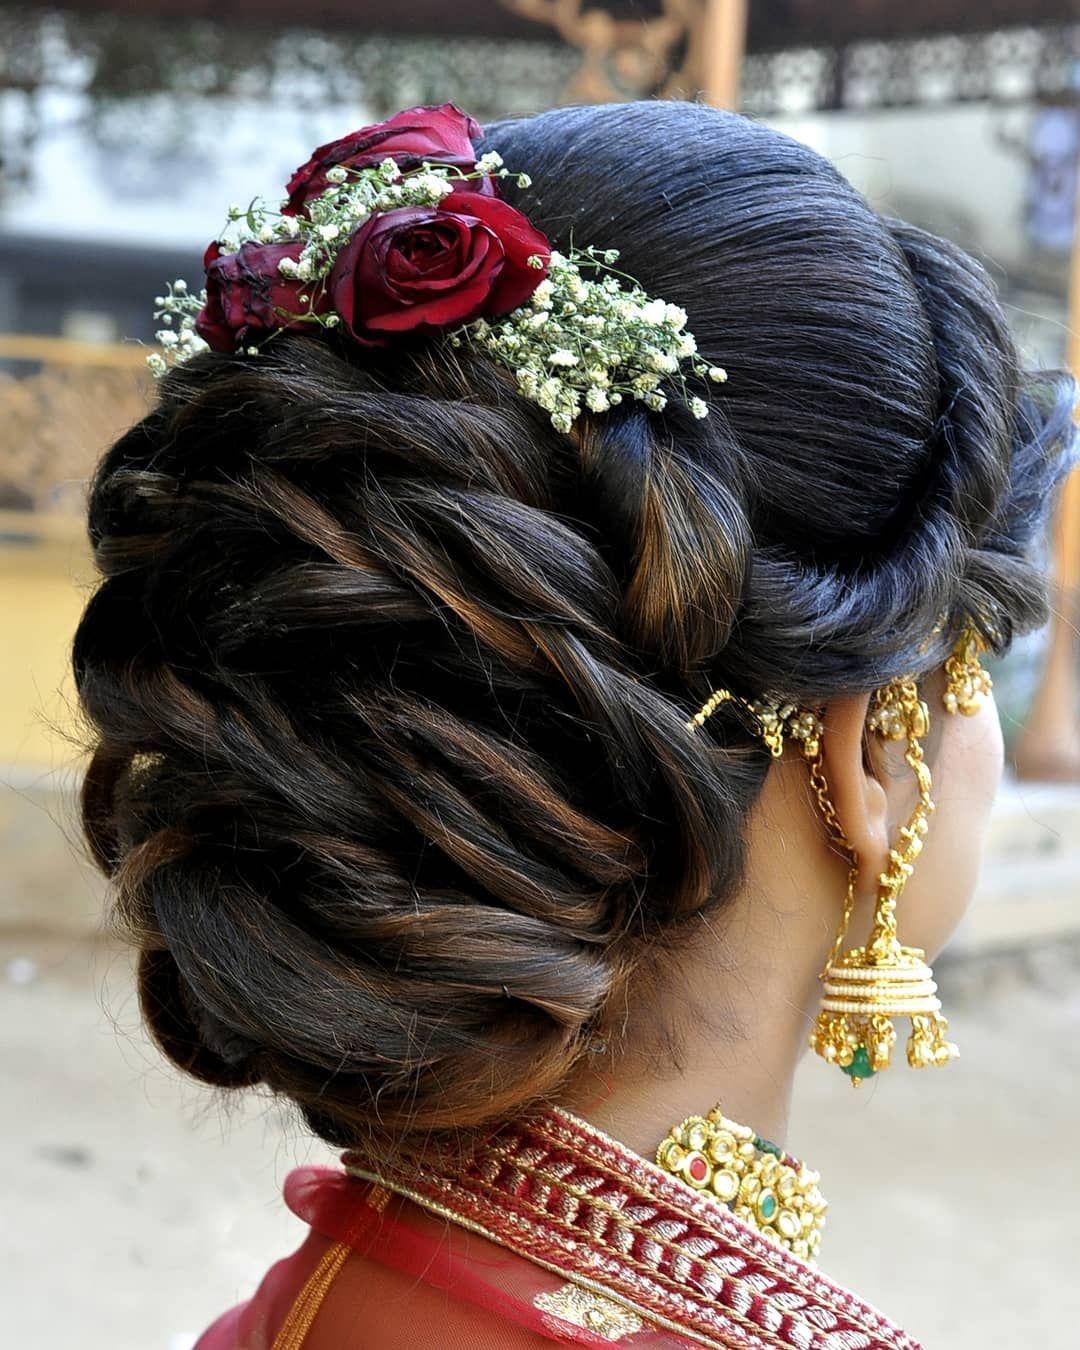 Modern Indian Bride Hairstyle: Instagram Post By Devanshi Beauty Parlour • Dec 27, 2018